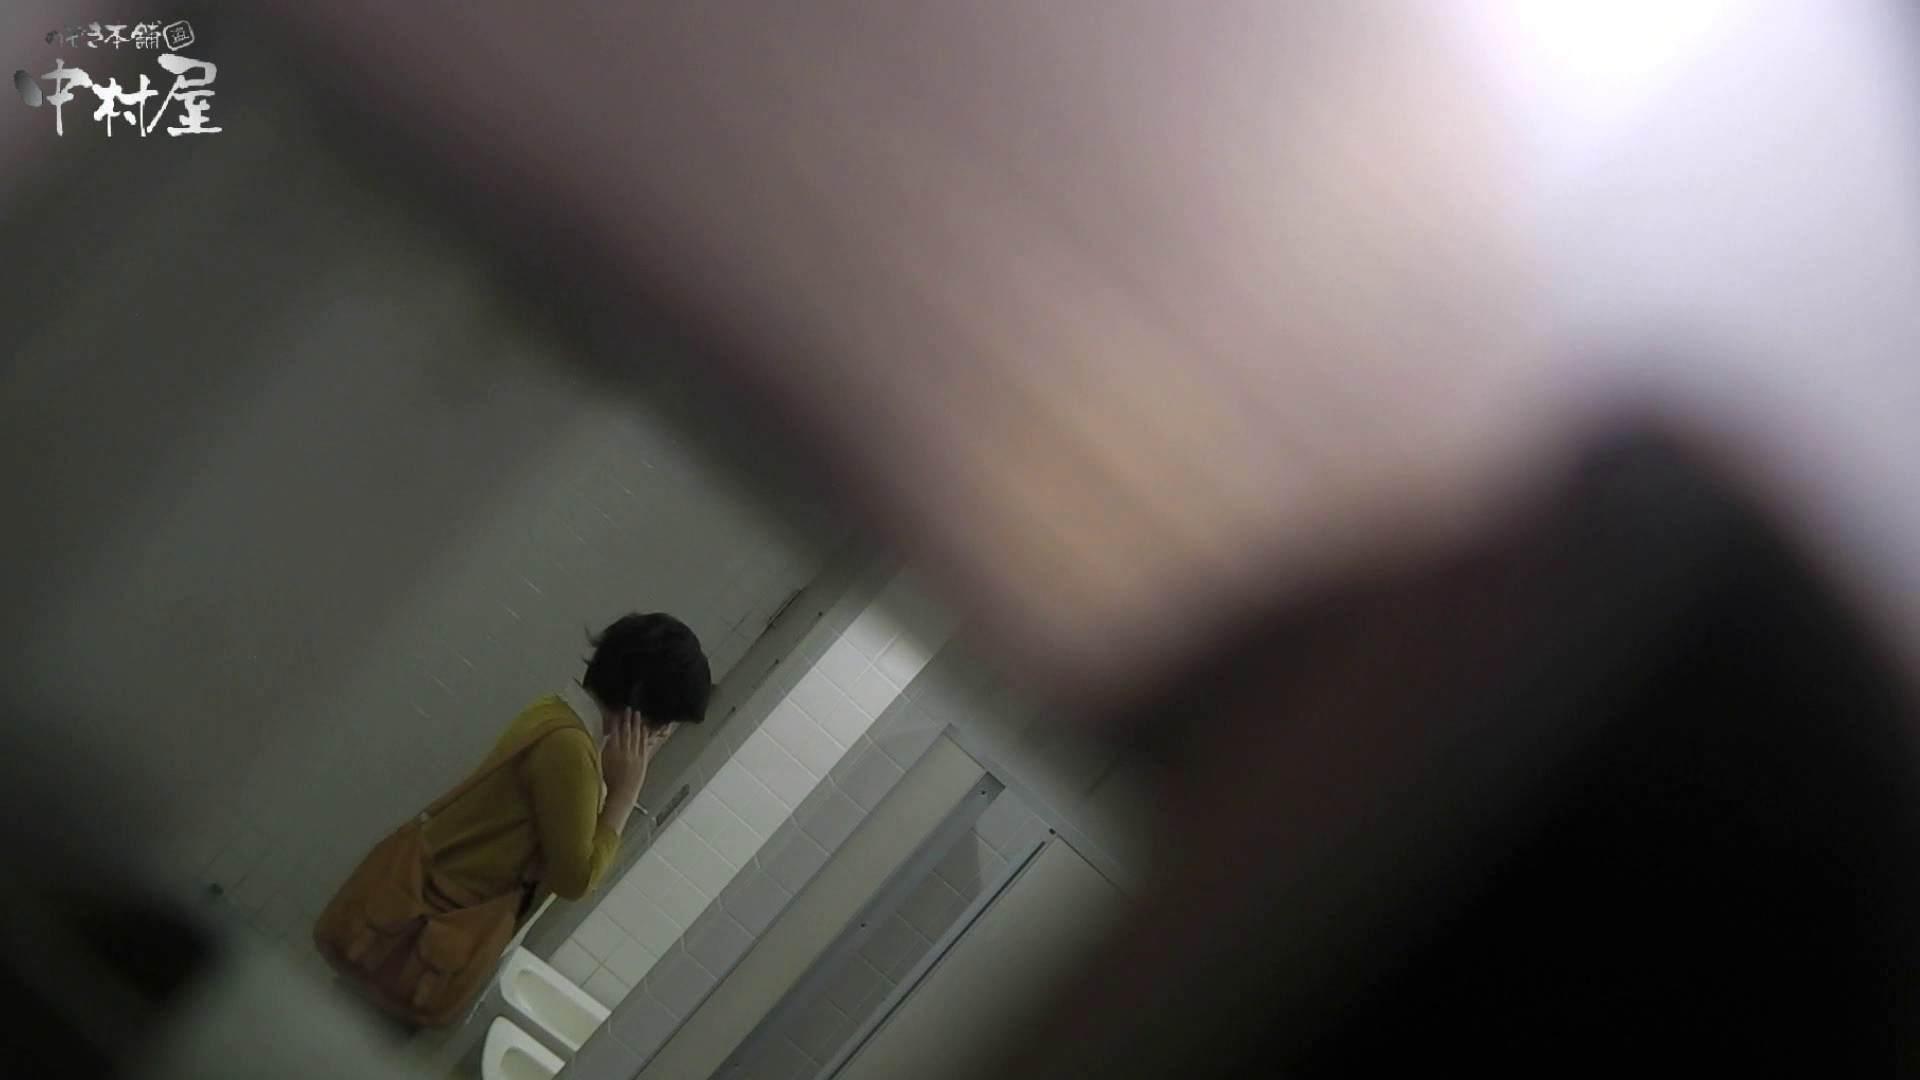 vol.54 命がけ潜伏洗面所! ヲリモノとろりん後編 プライベート  109連発 84